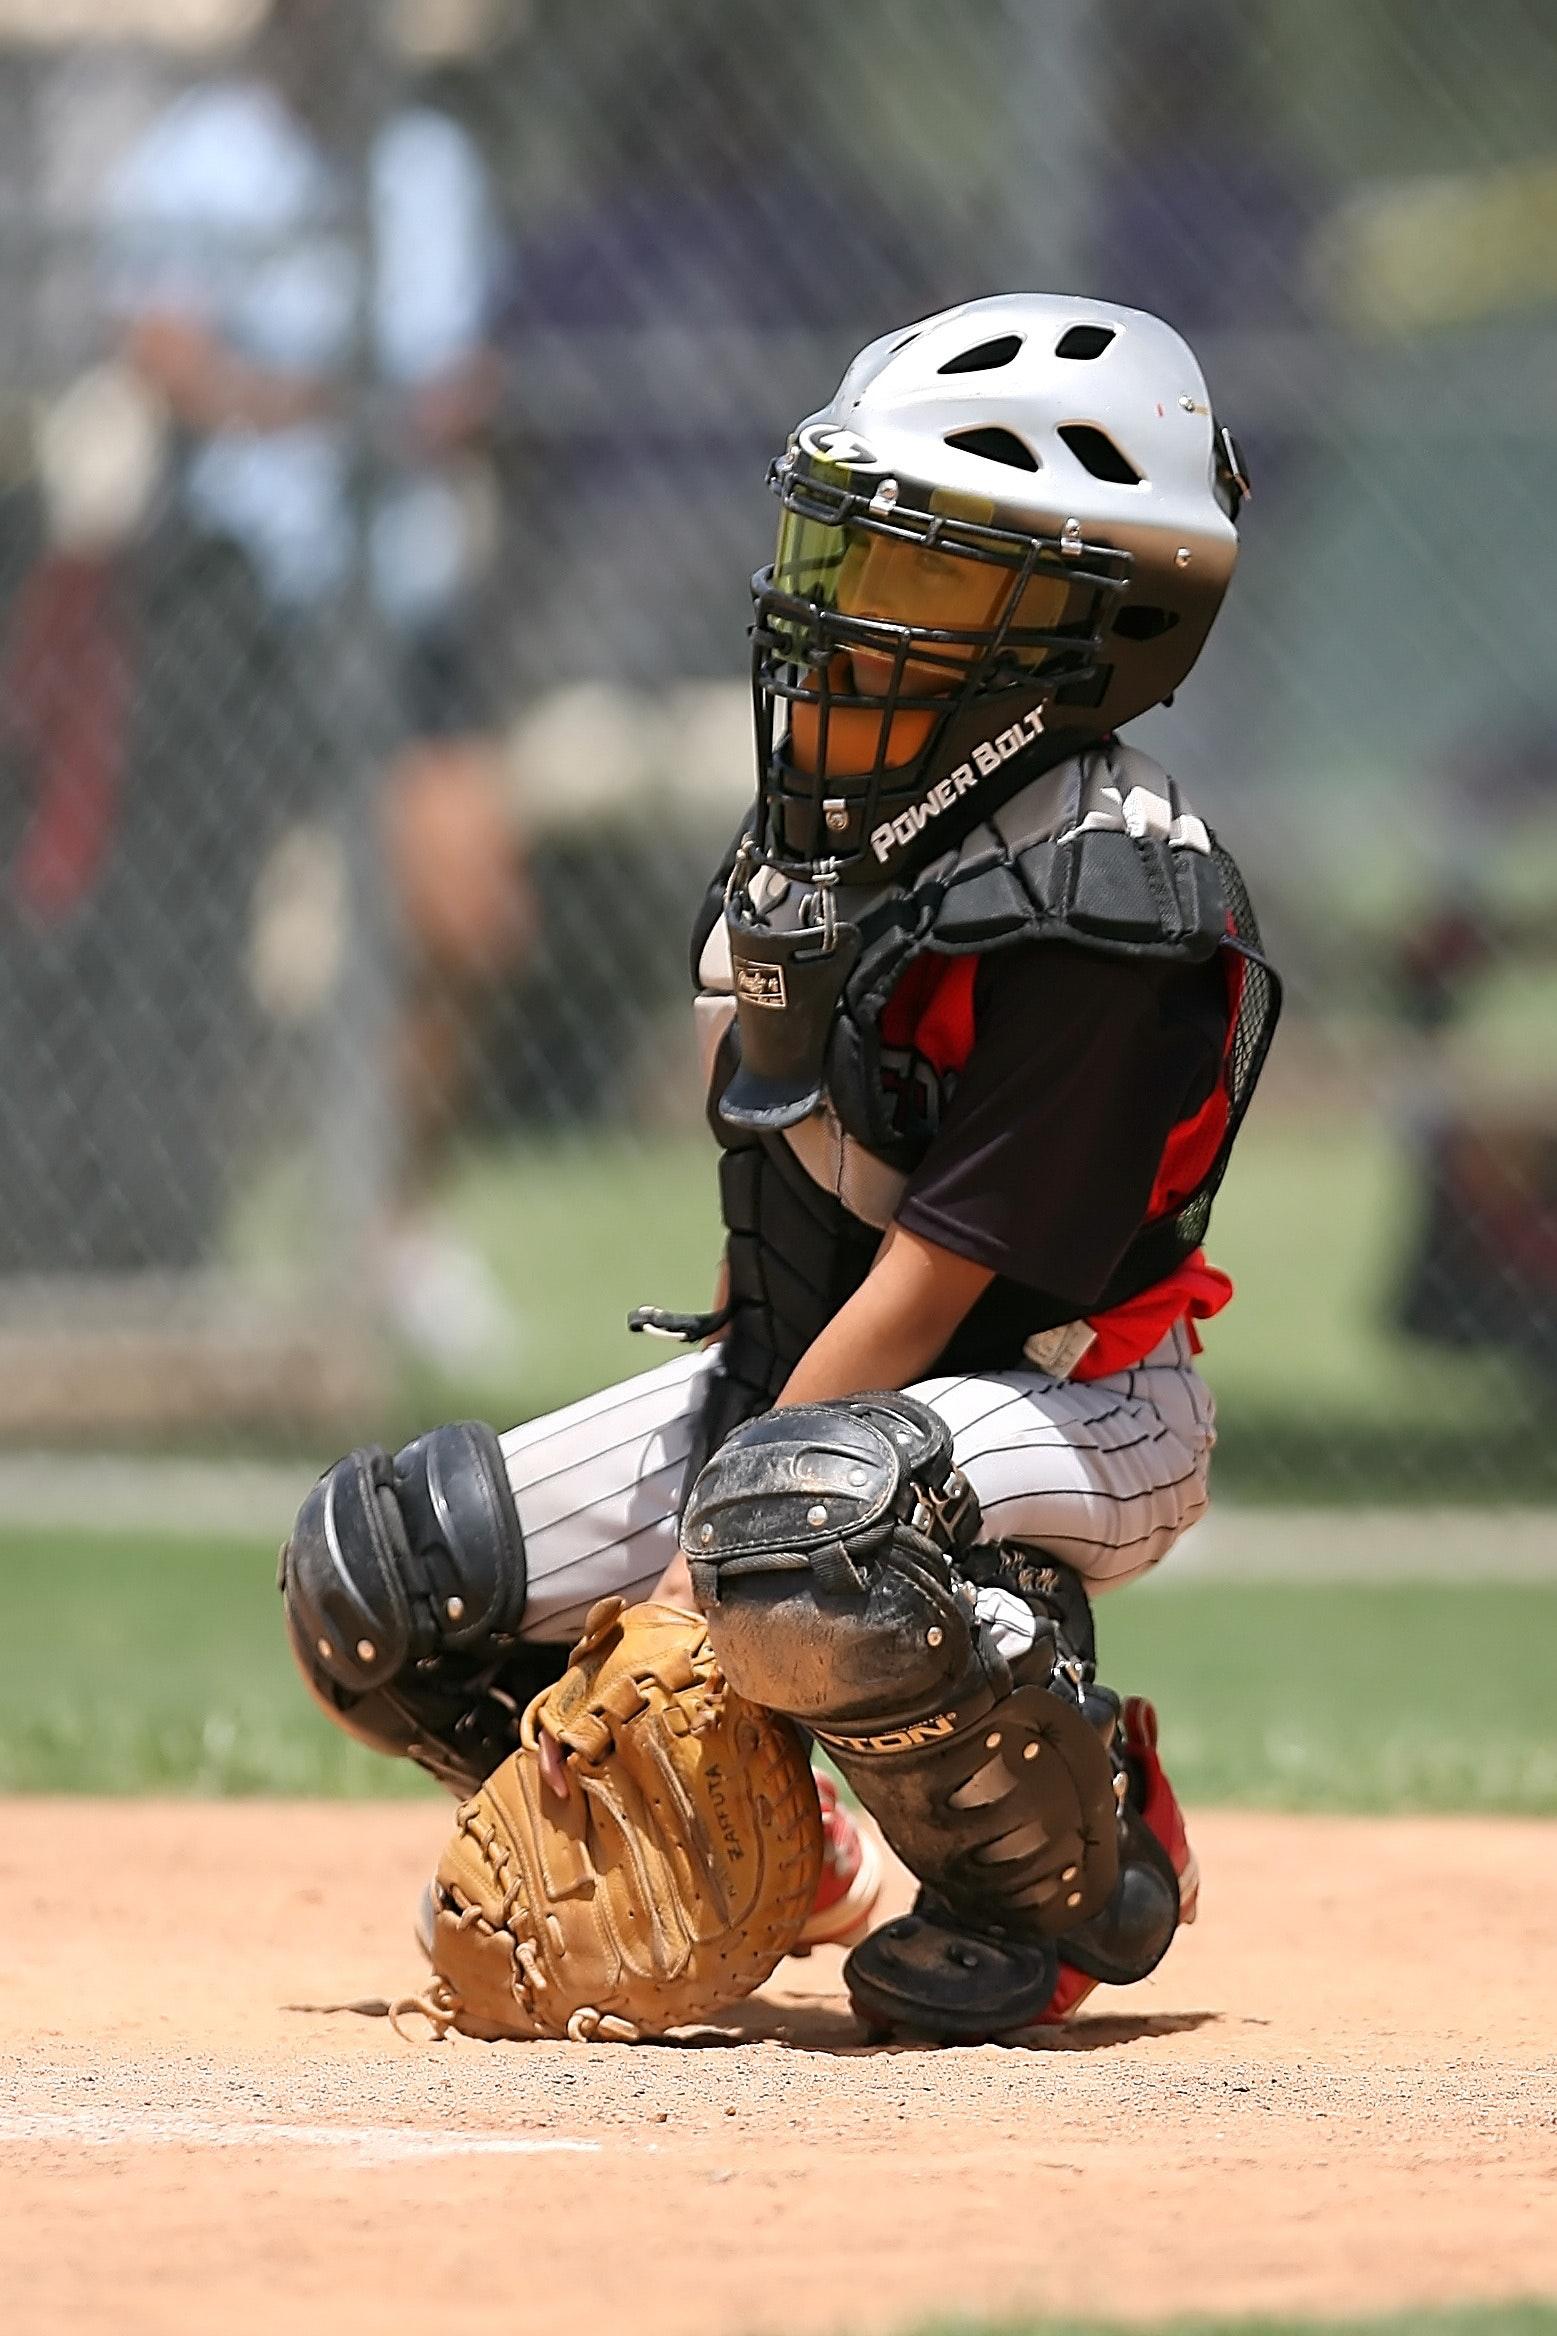 Boy in Black Power Balt Baseball Helmet, Athlete, Baseball, Boy, Catcher, HQ Photo